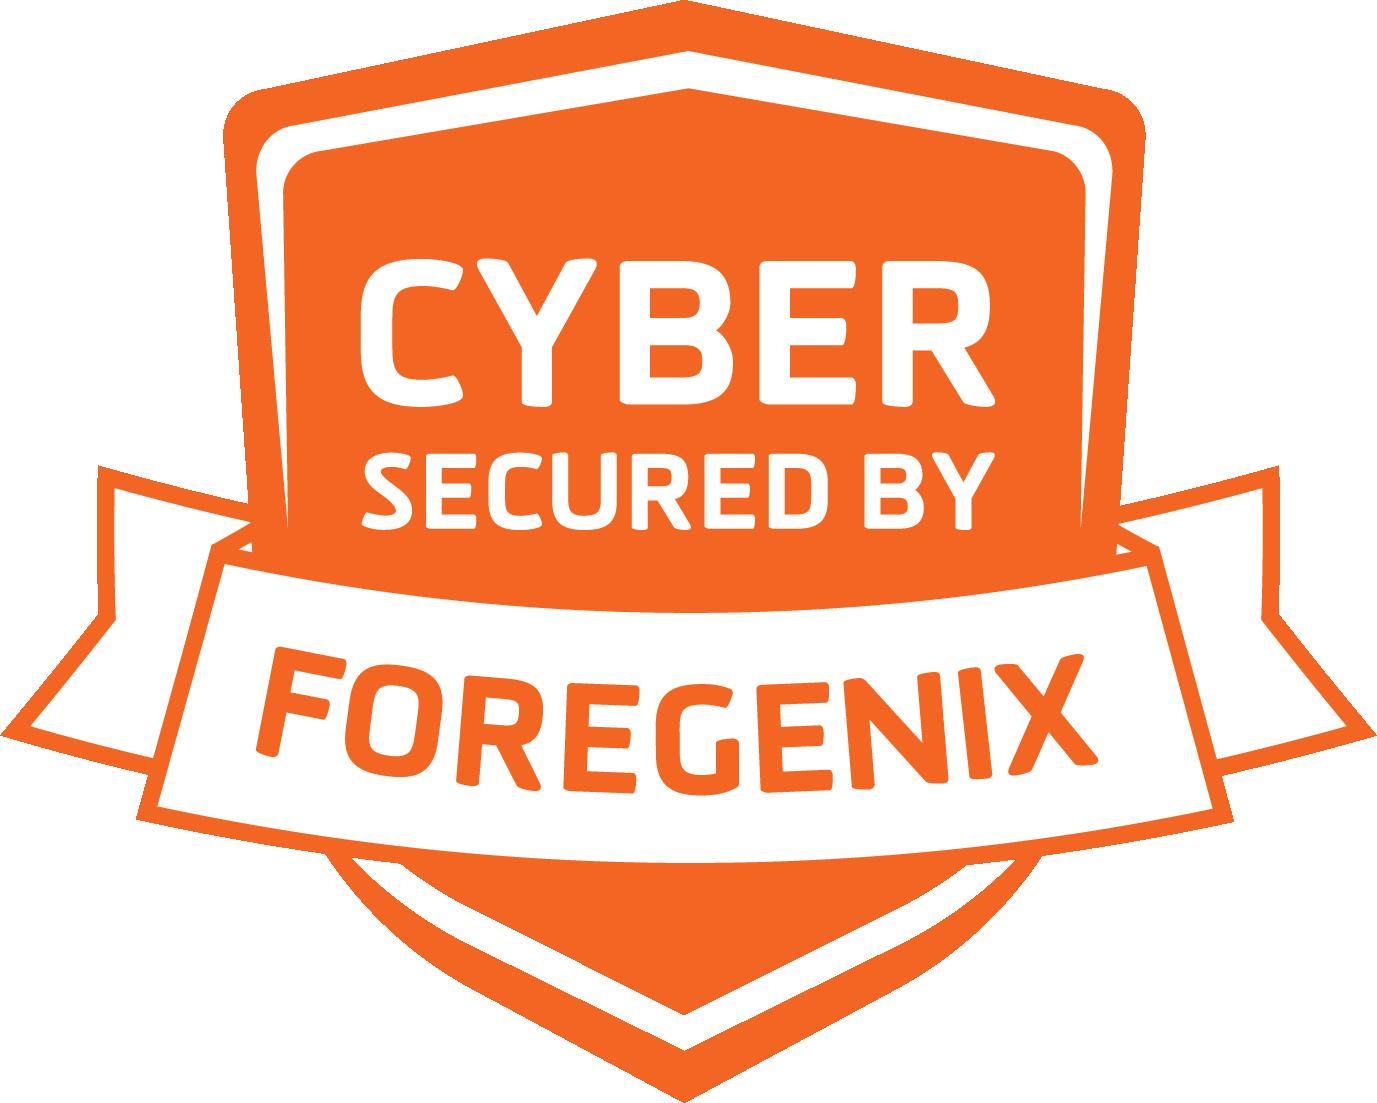 fgx web secure seal